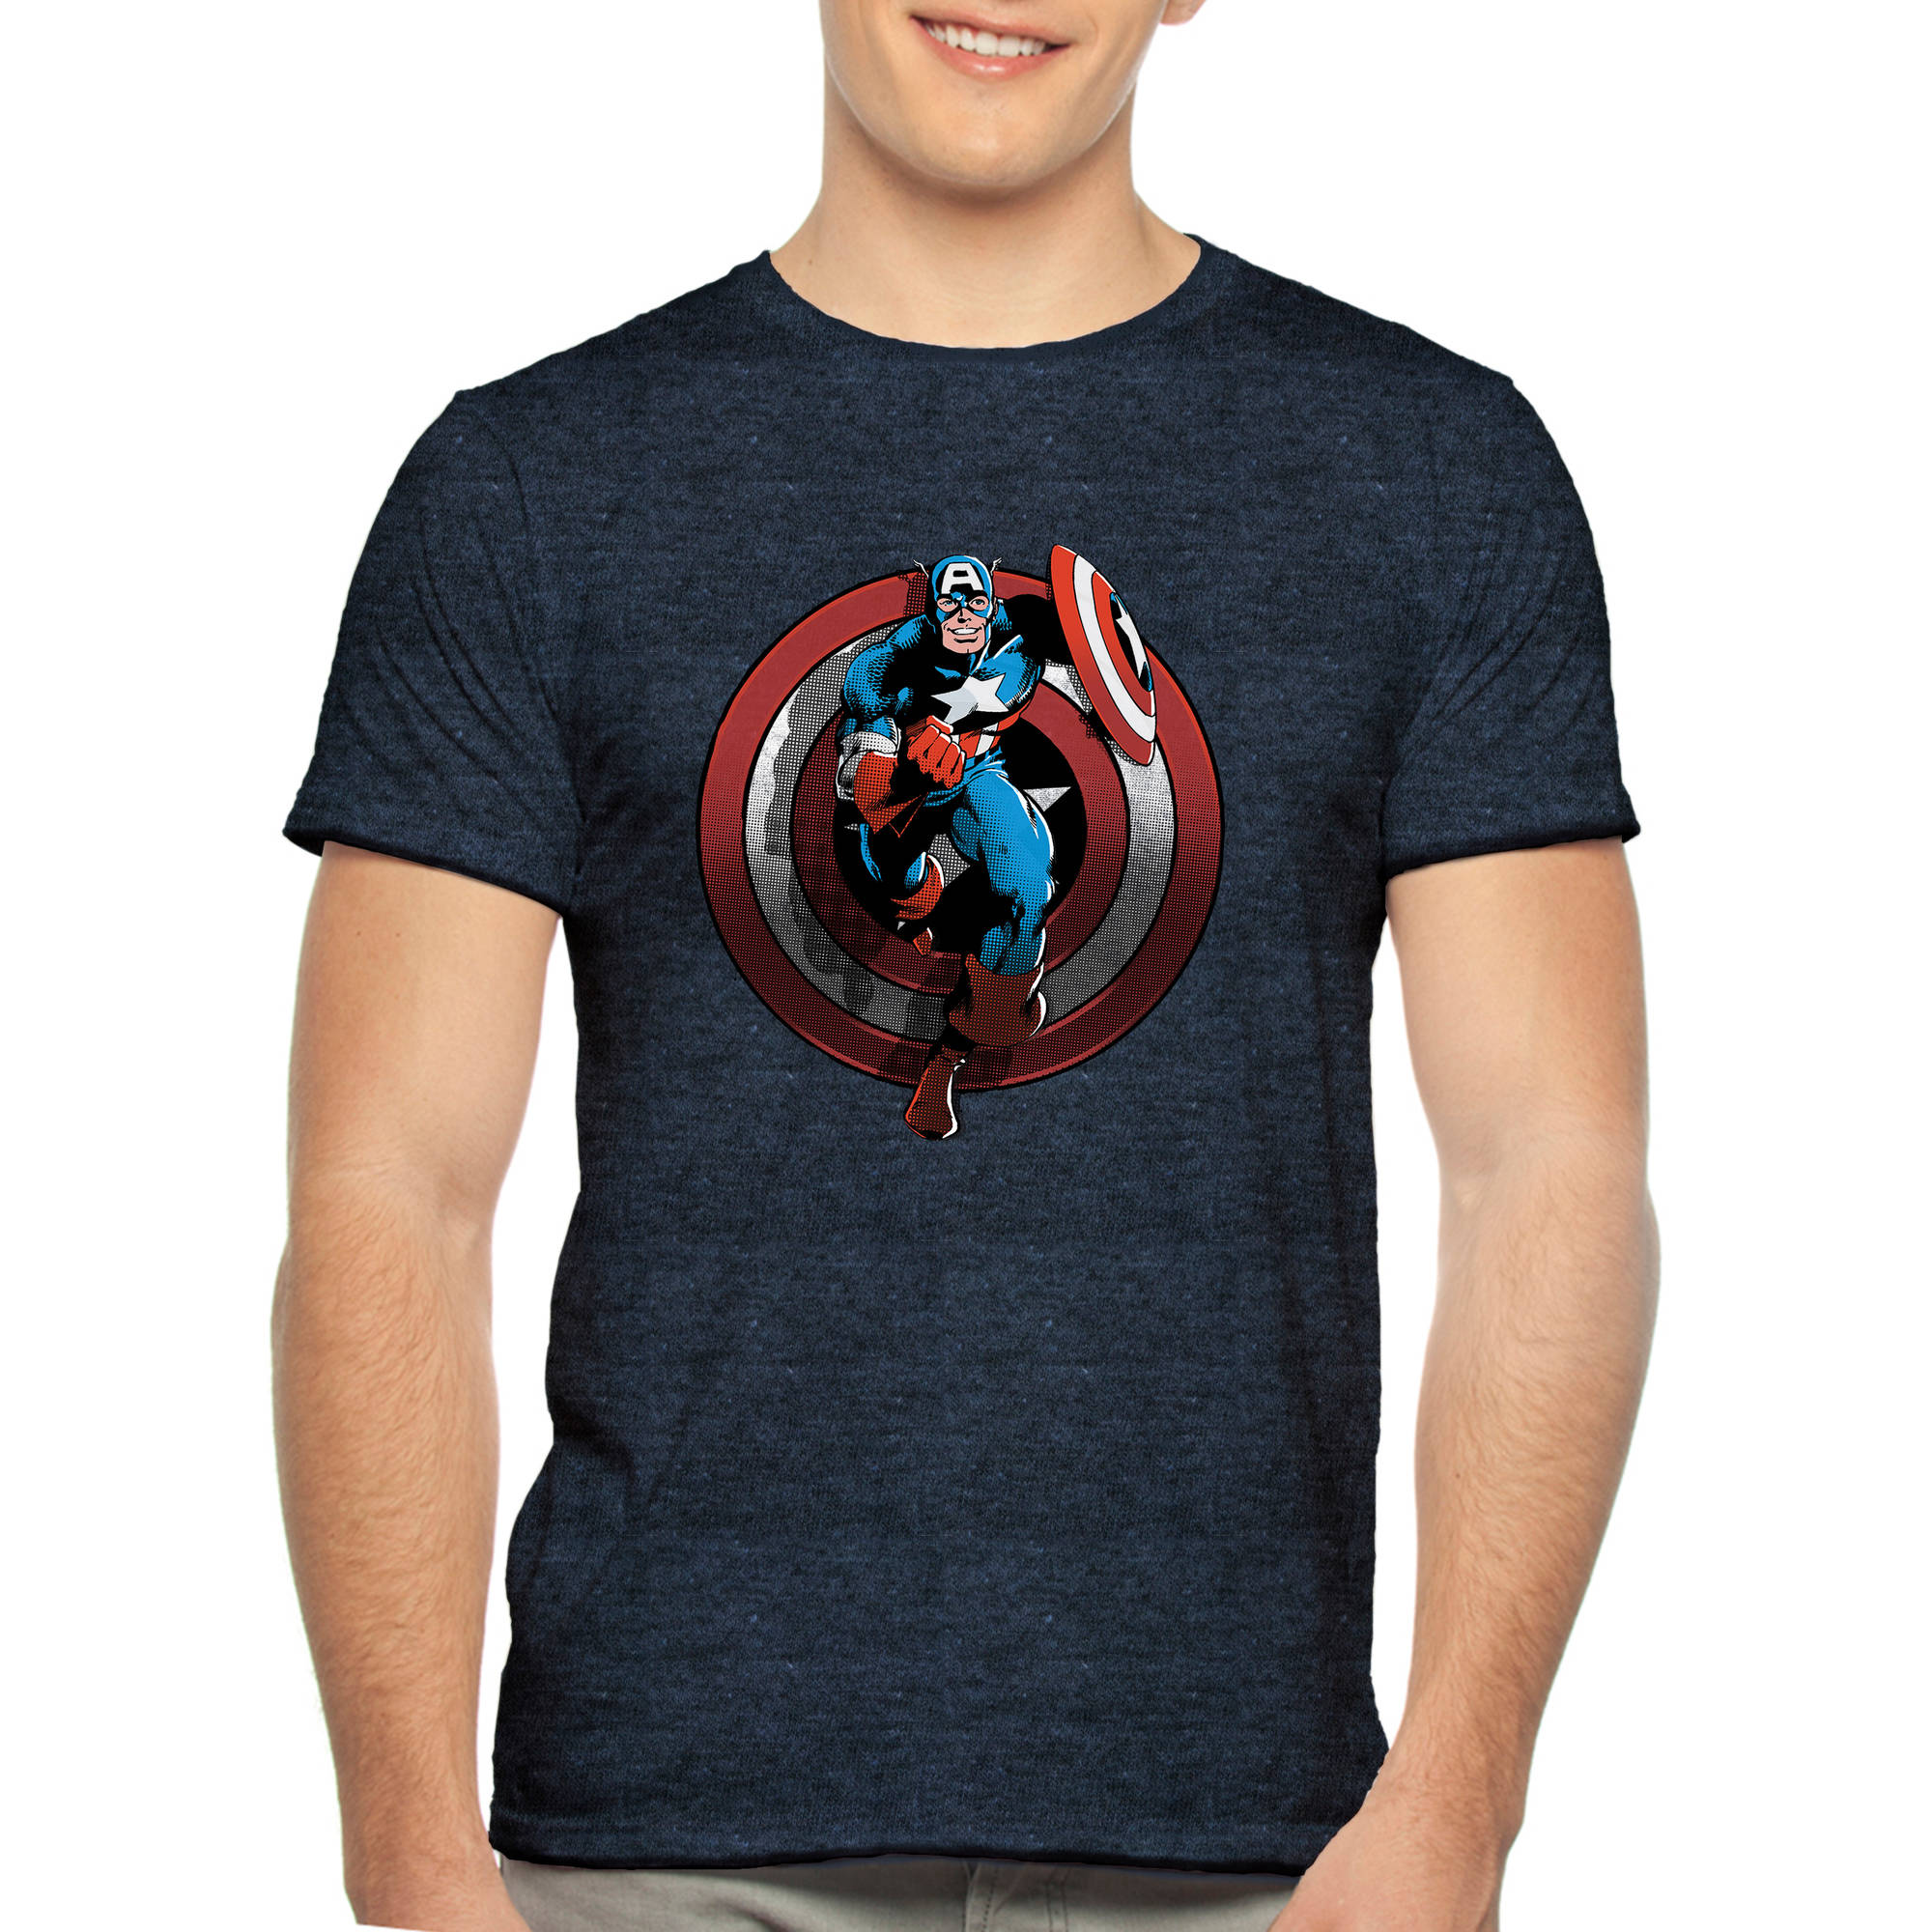 Marvel Captain America on Shield Men's Graphic Tee